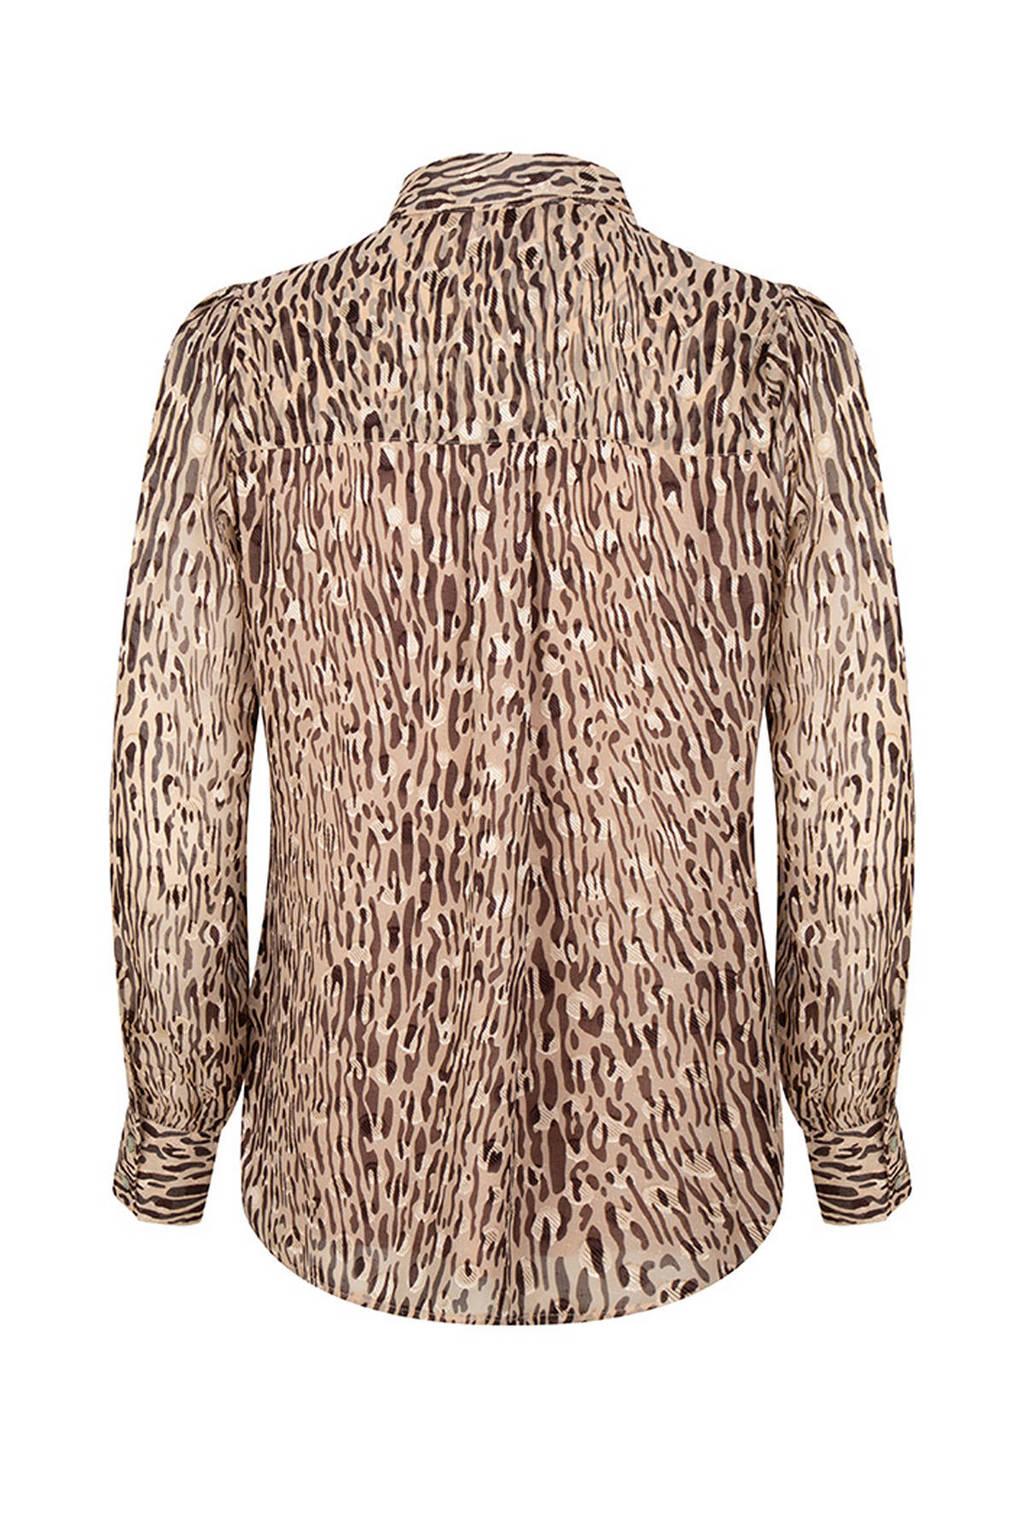 Esqualo semi-transparante blouse met dierenprint lichtbruin/bruin/zwart, Lichtbruin/bruin/zwart